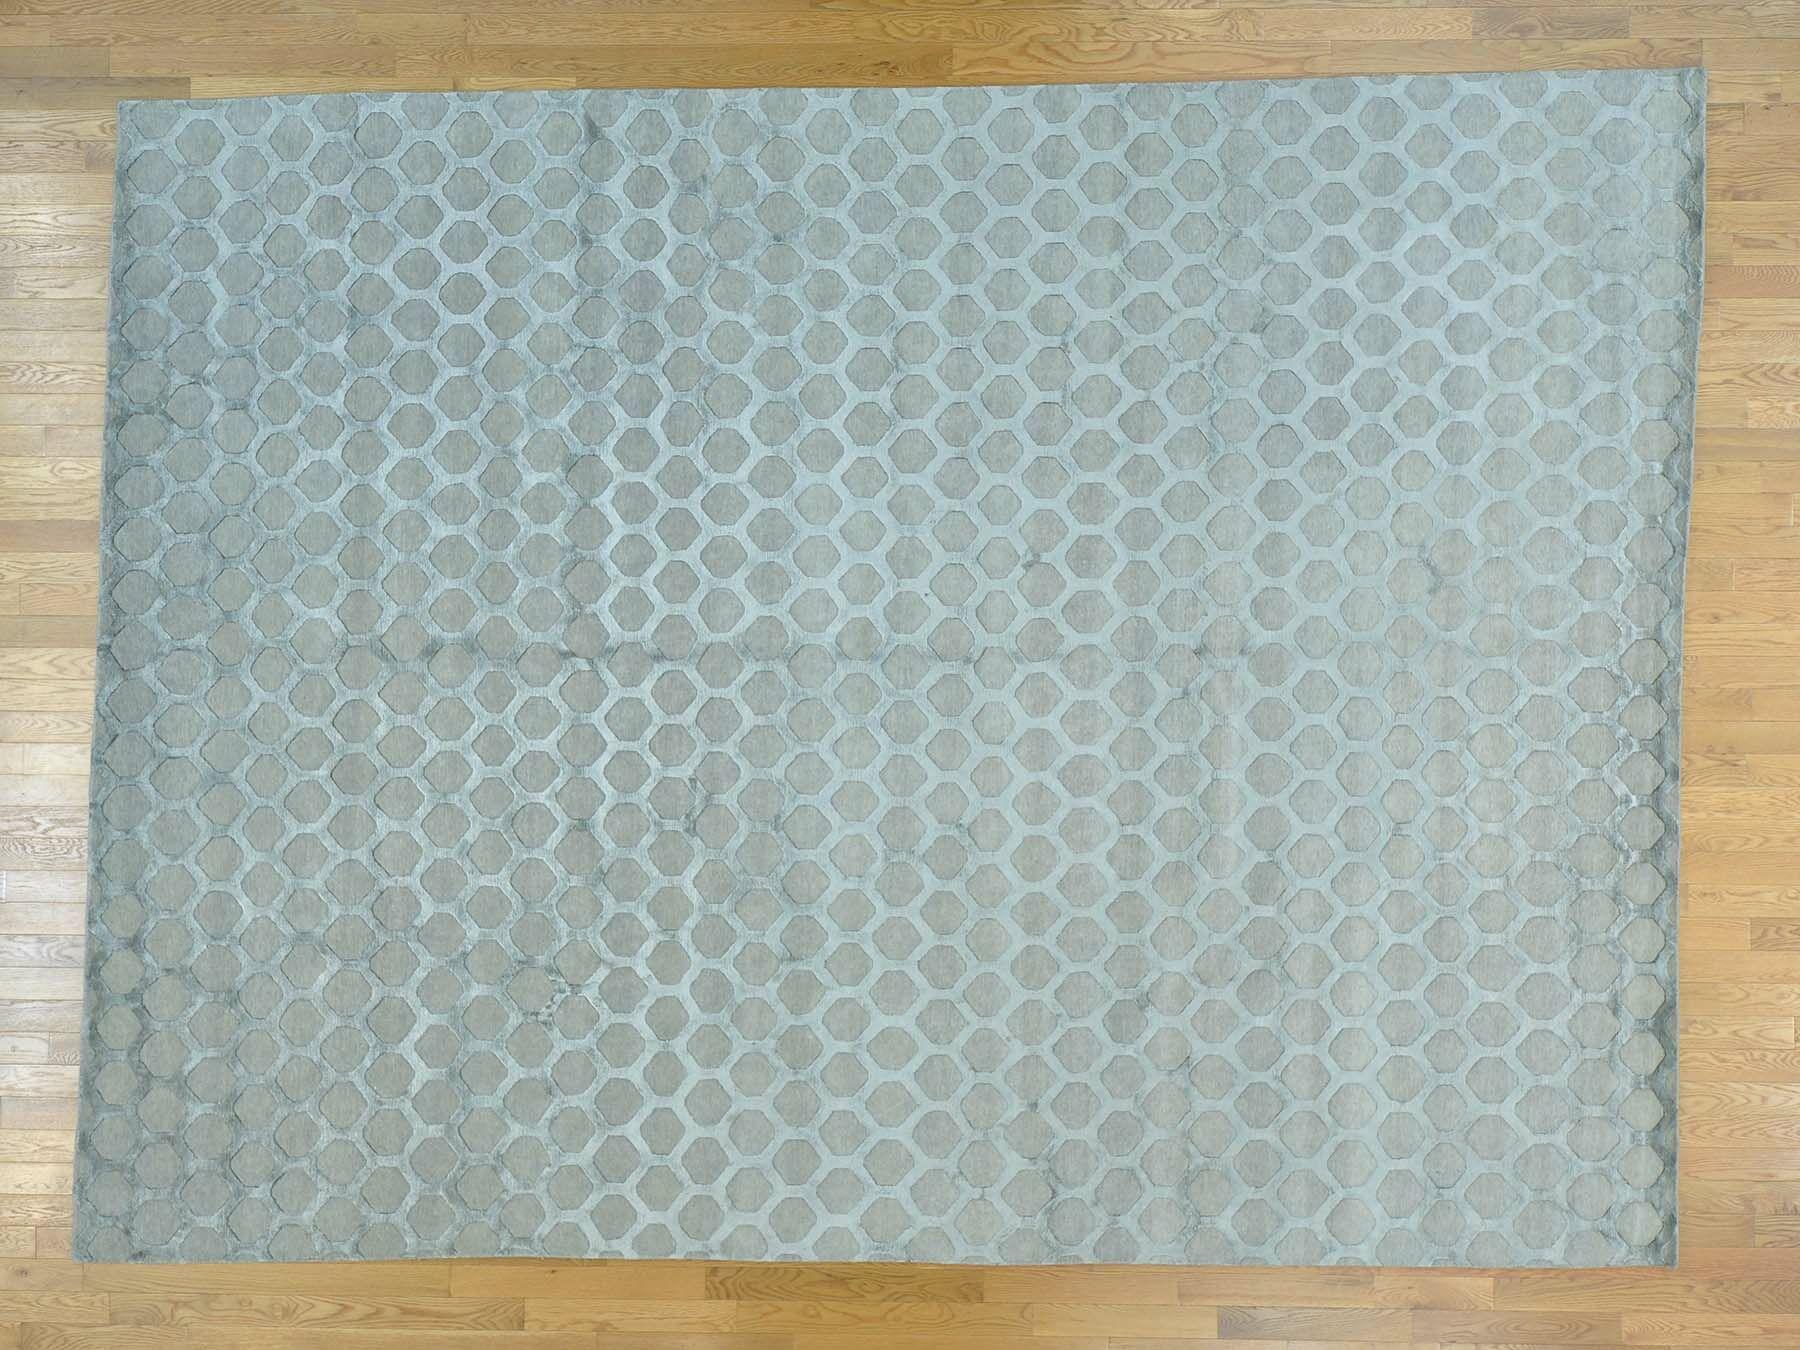 One-of-a-Kind Brecht Honeycomb Design Handwoven Grey Wool/Silk Area Rug